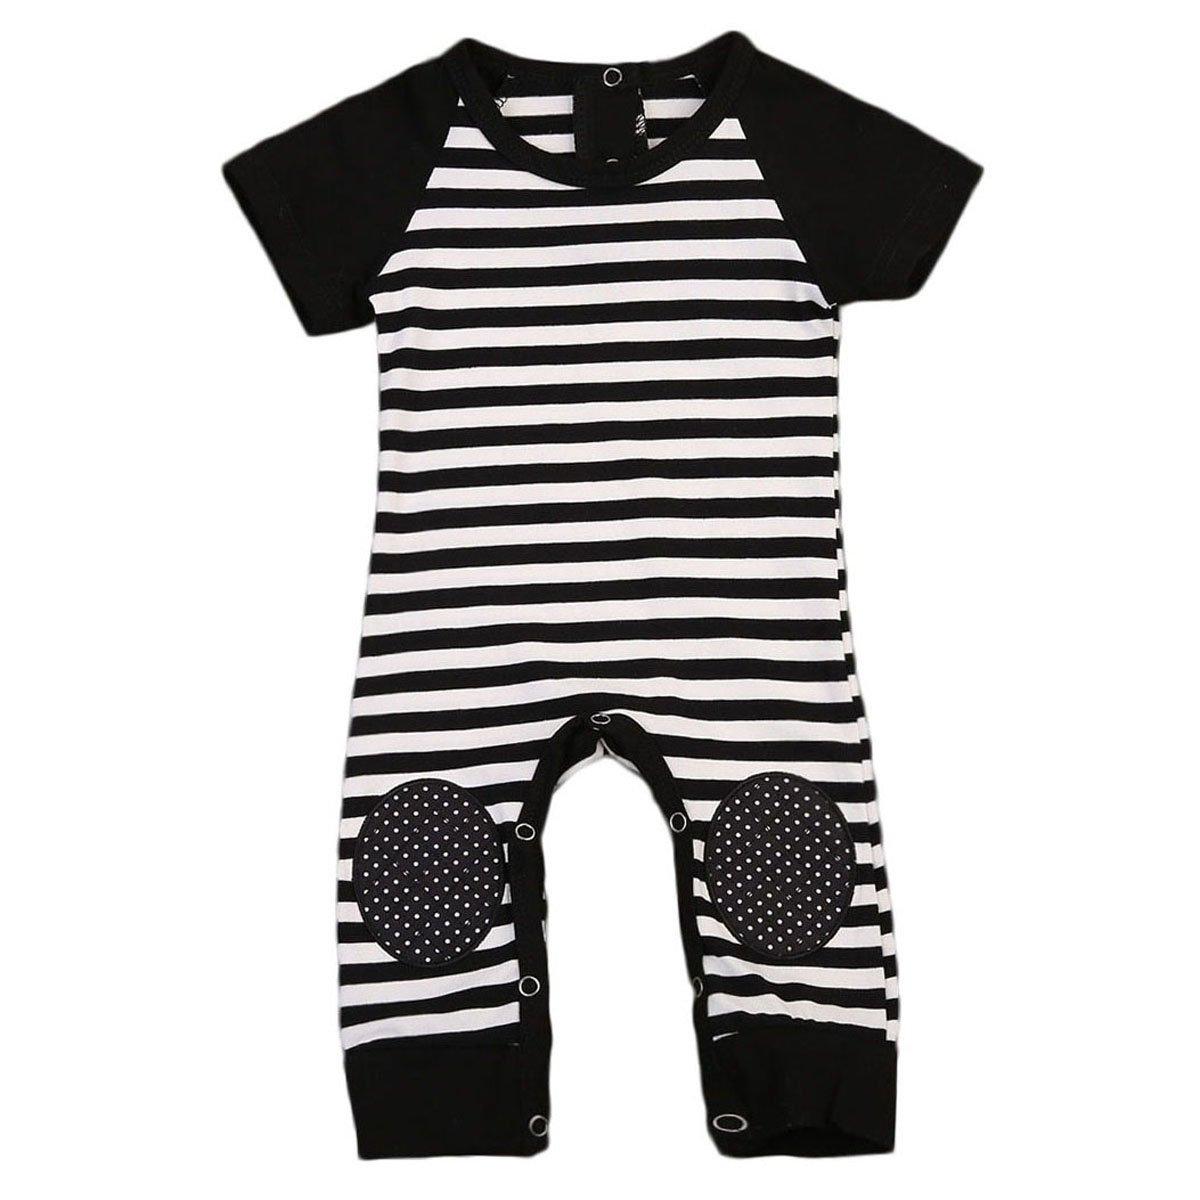 Newborn Baby Boy Striped Romper Outfits Short Sleeve Summer Bodysuit (6-12M, Black)